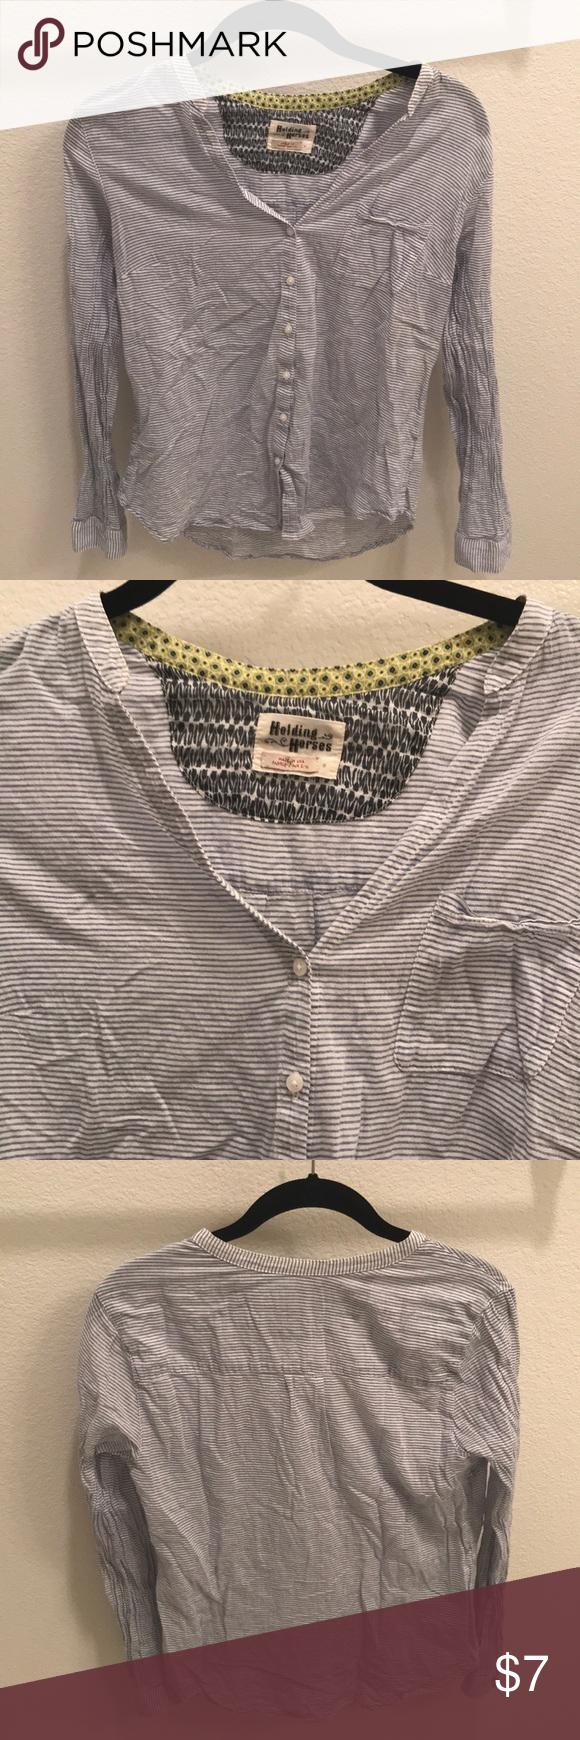 Flannel into dress  Anthropologie Striped Flannel  My Posh Picks  Pinterest  Flannel